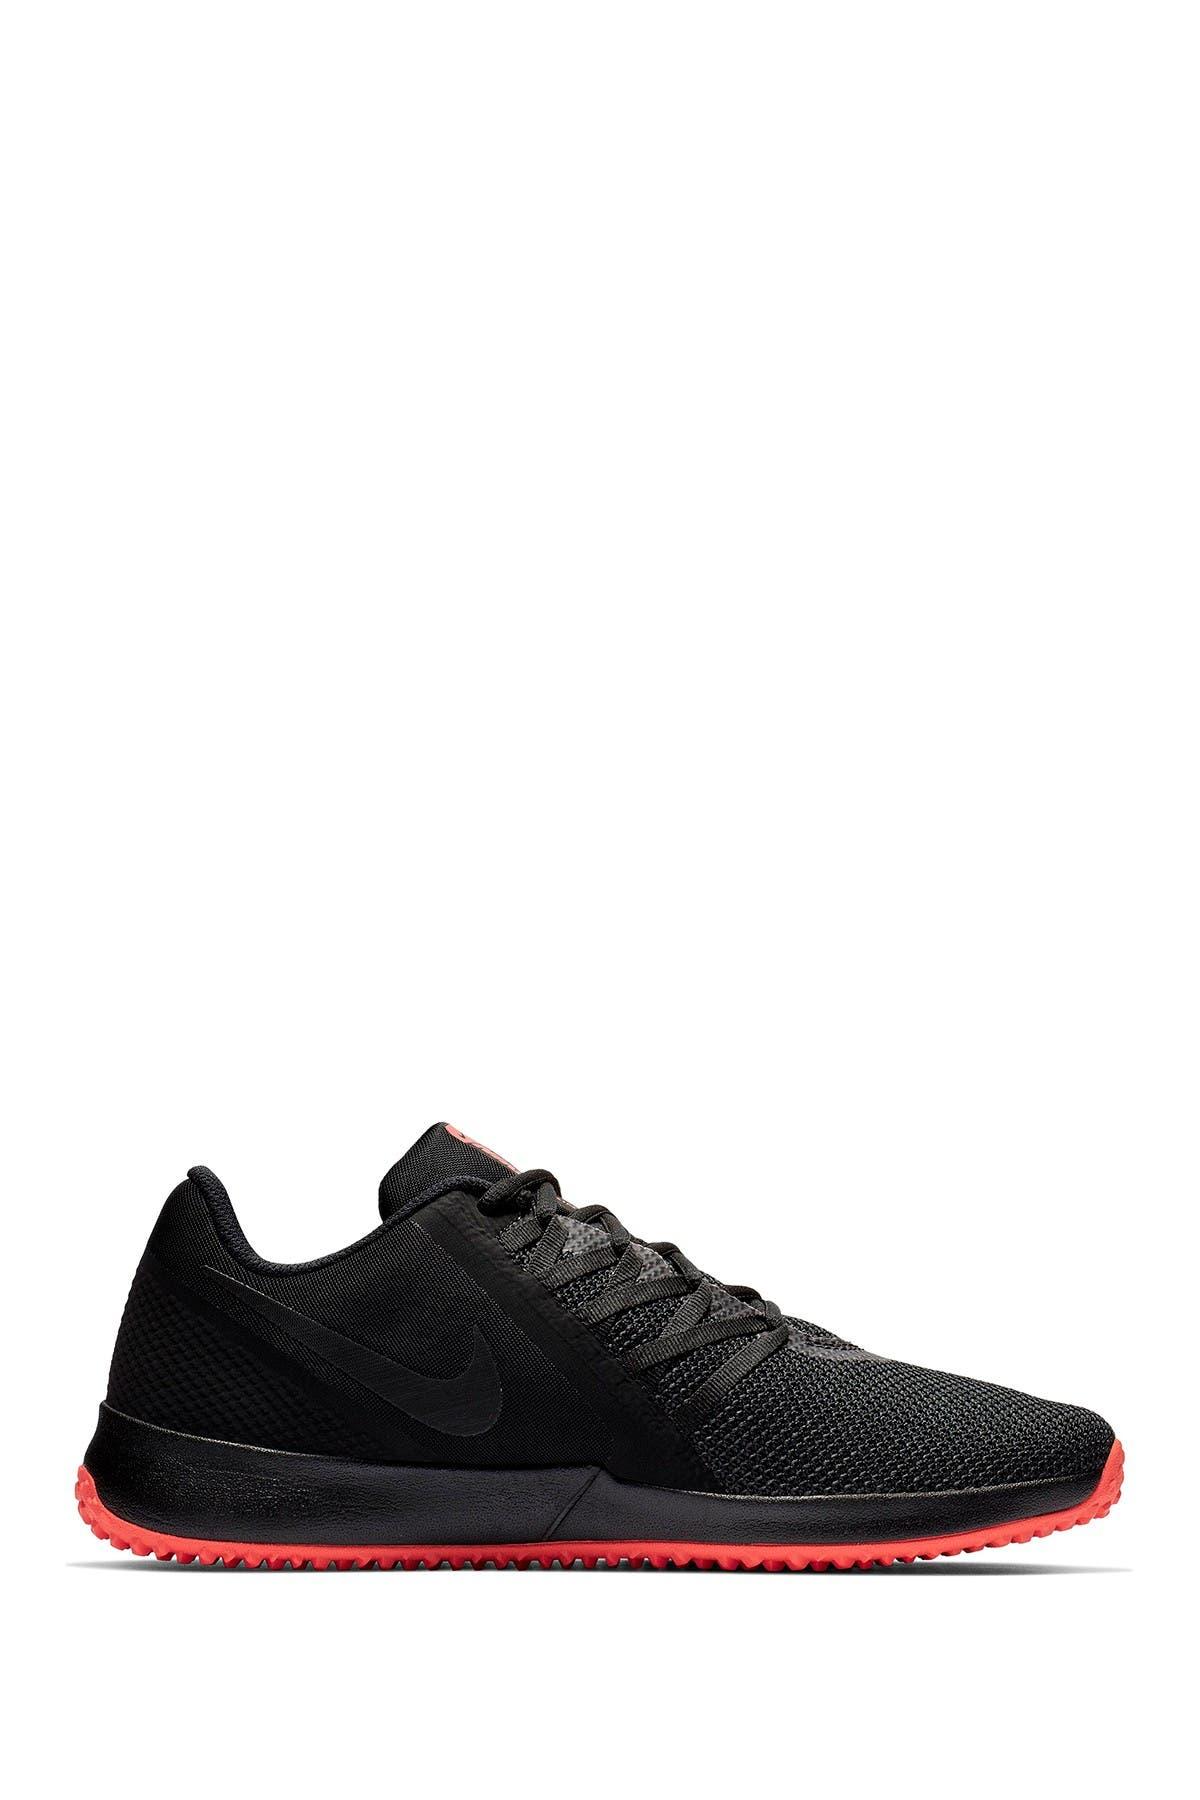 Image of Nike Varsity Complete Training Sneaker